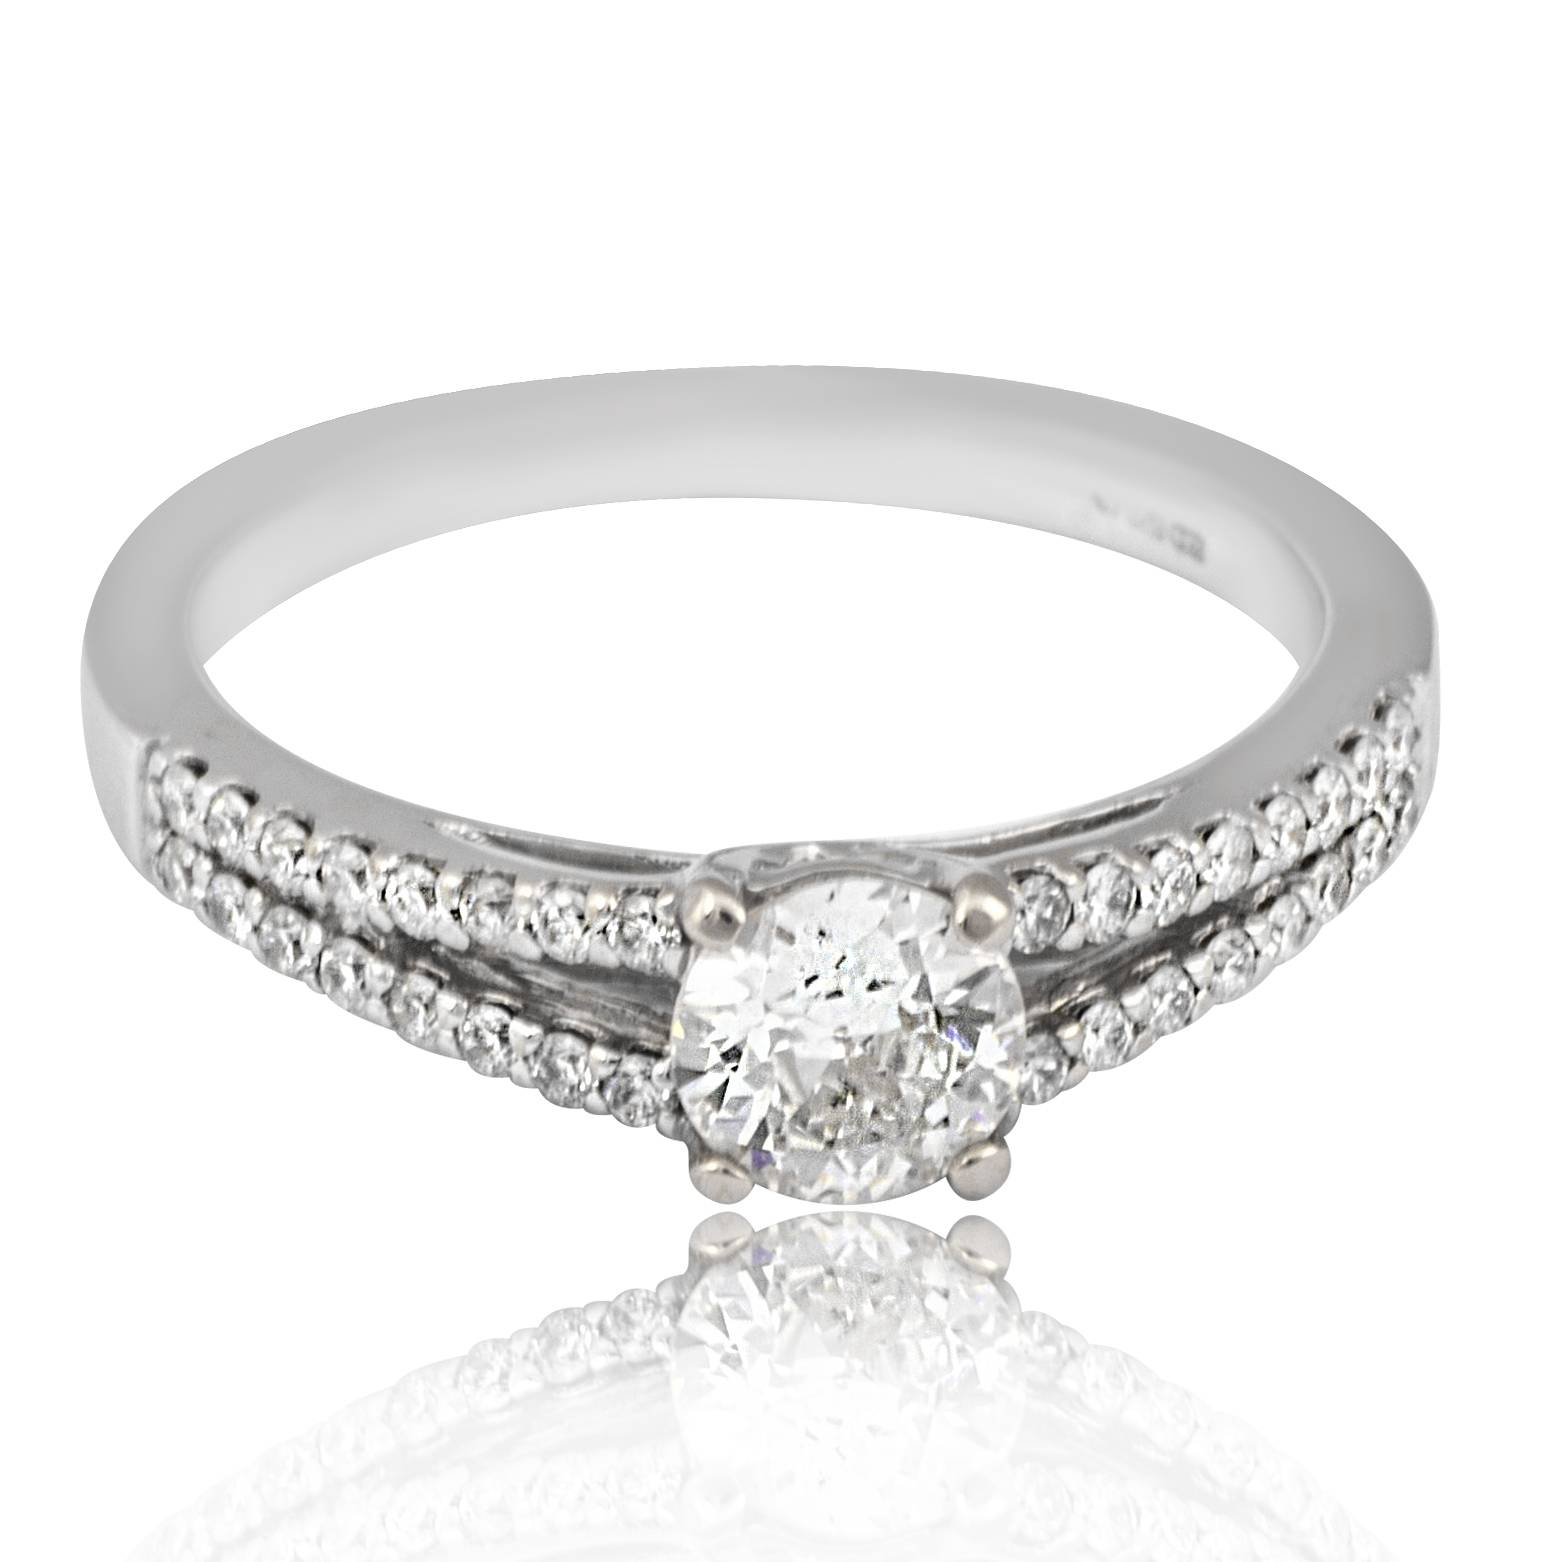 0.4 Carat Old European Cut Diamond With Split Shank | Engagement With Regard To Split Shank Wedding Rings (Gallery 15 of 15)